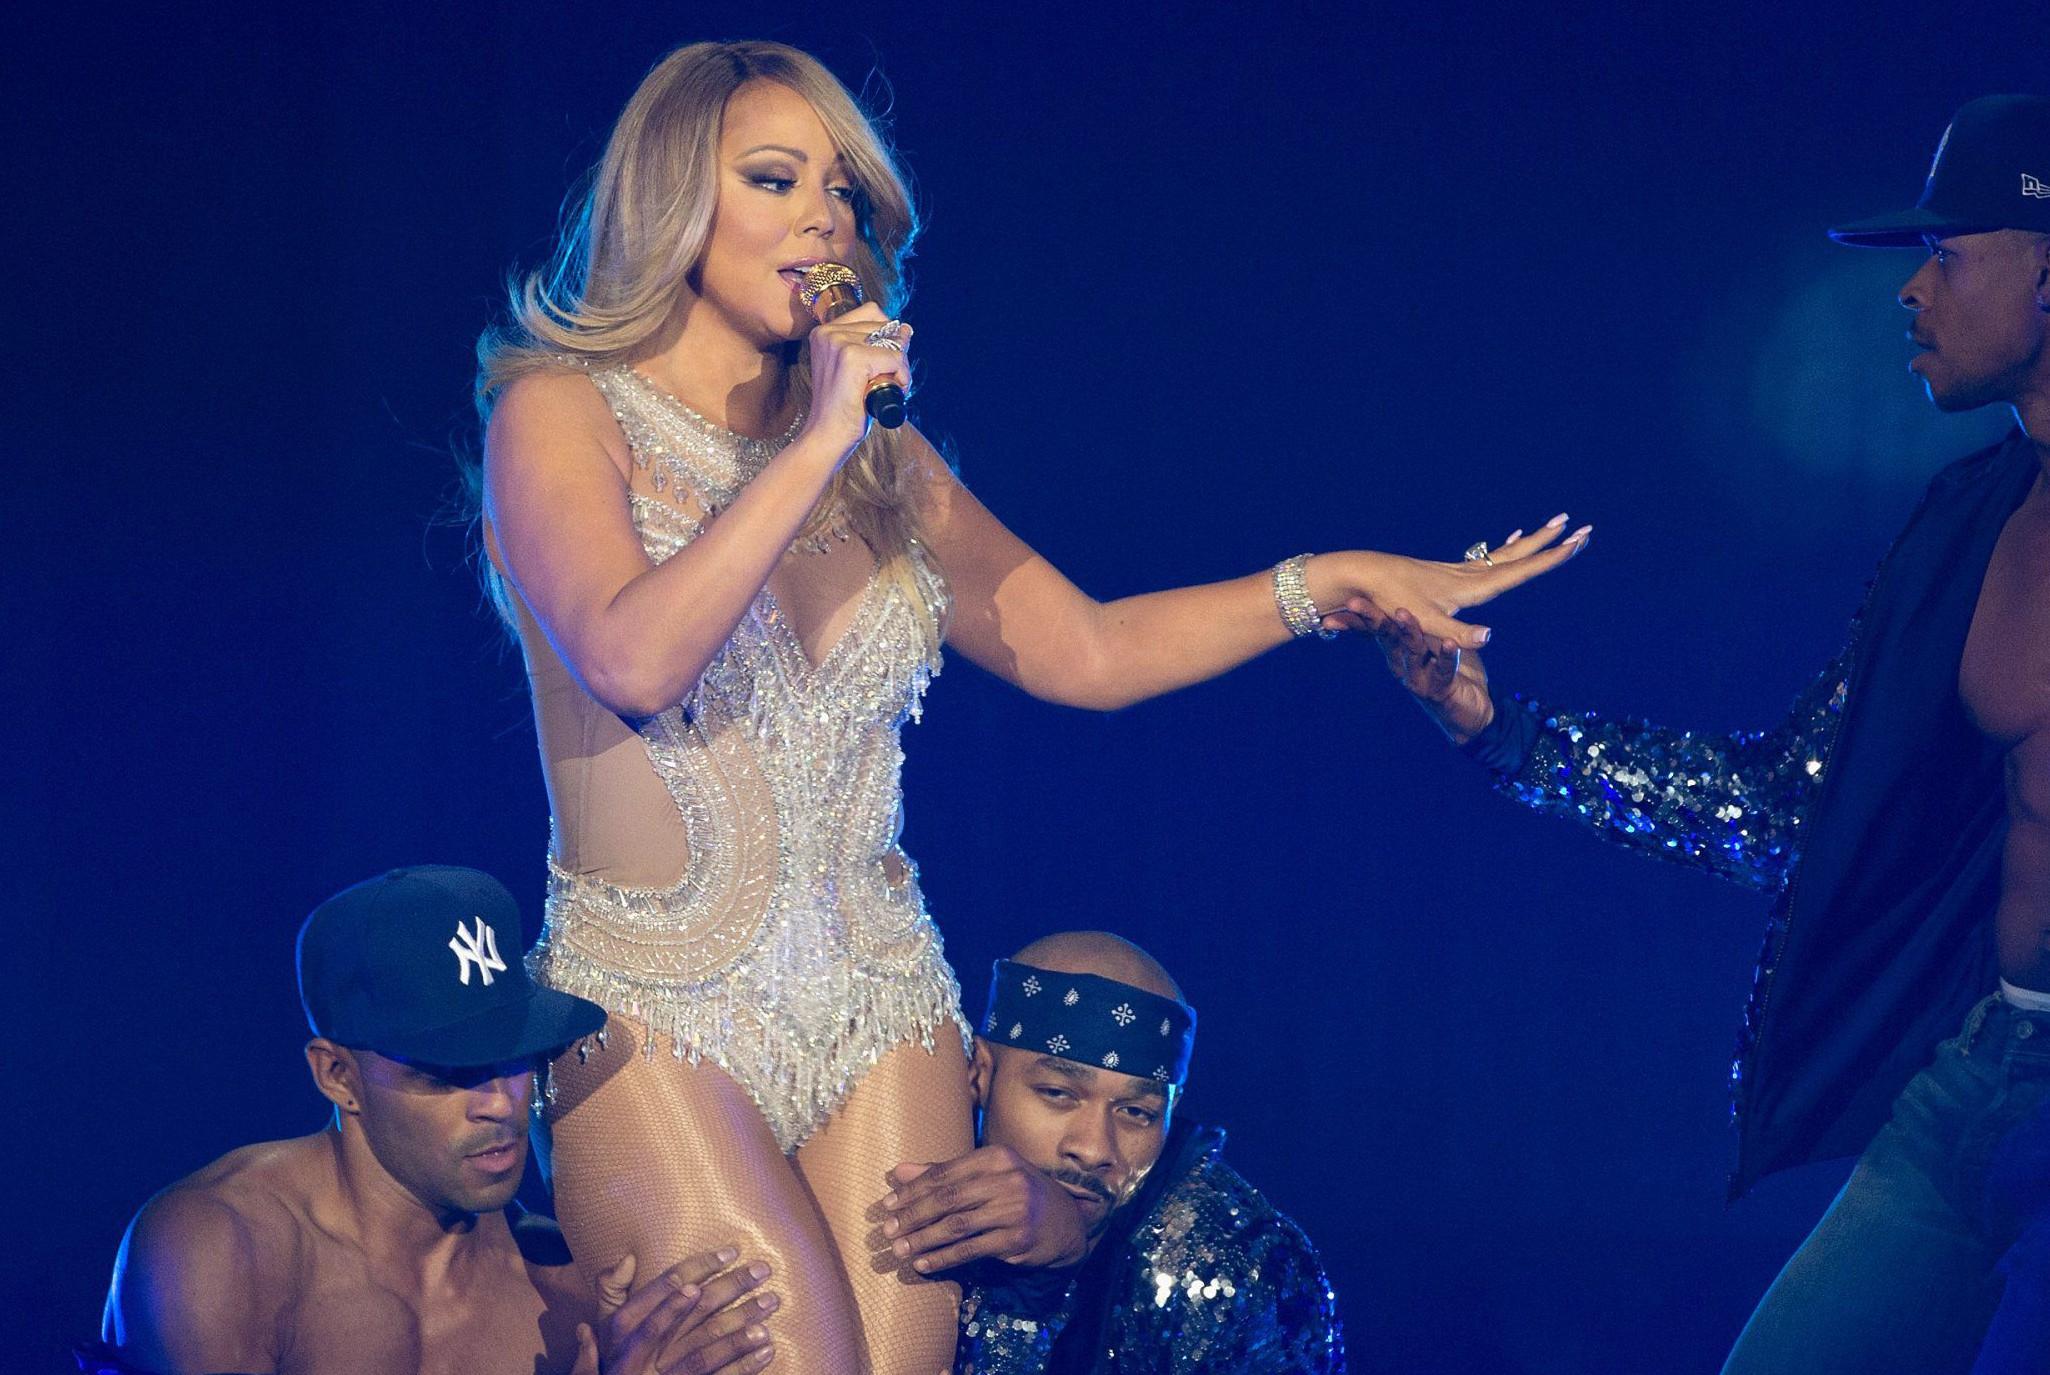 Mariah Carey live in London. Mariah Carey performs live at London's O2 Arena Featuring: Mariah Carey Where: London, United Kingdom When: 23 Mar 2016 Credit: WENN.com